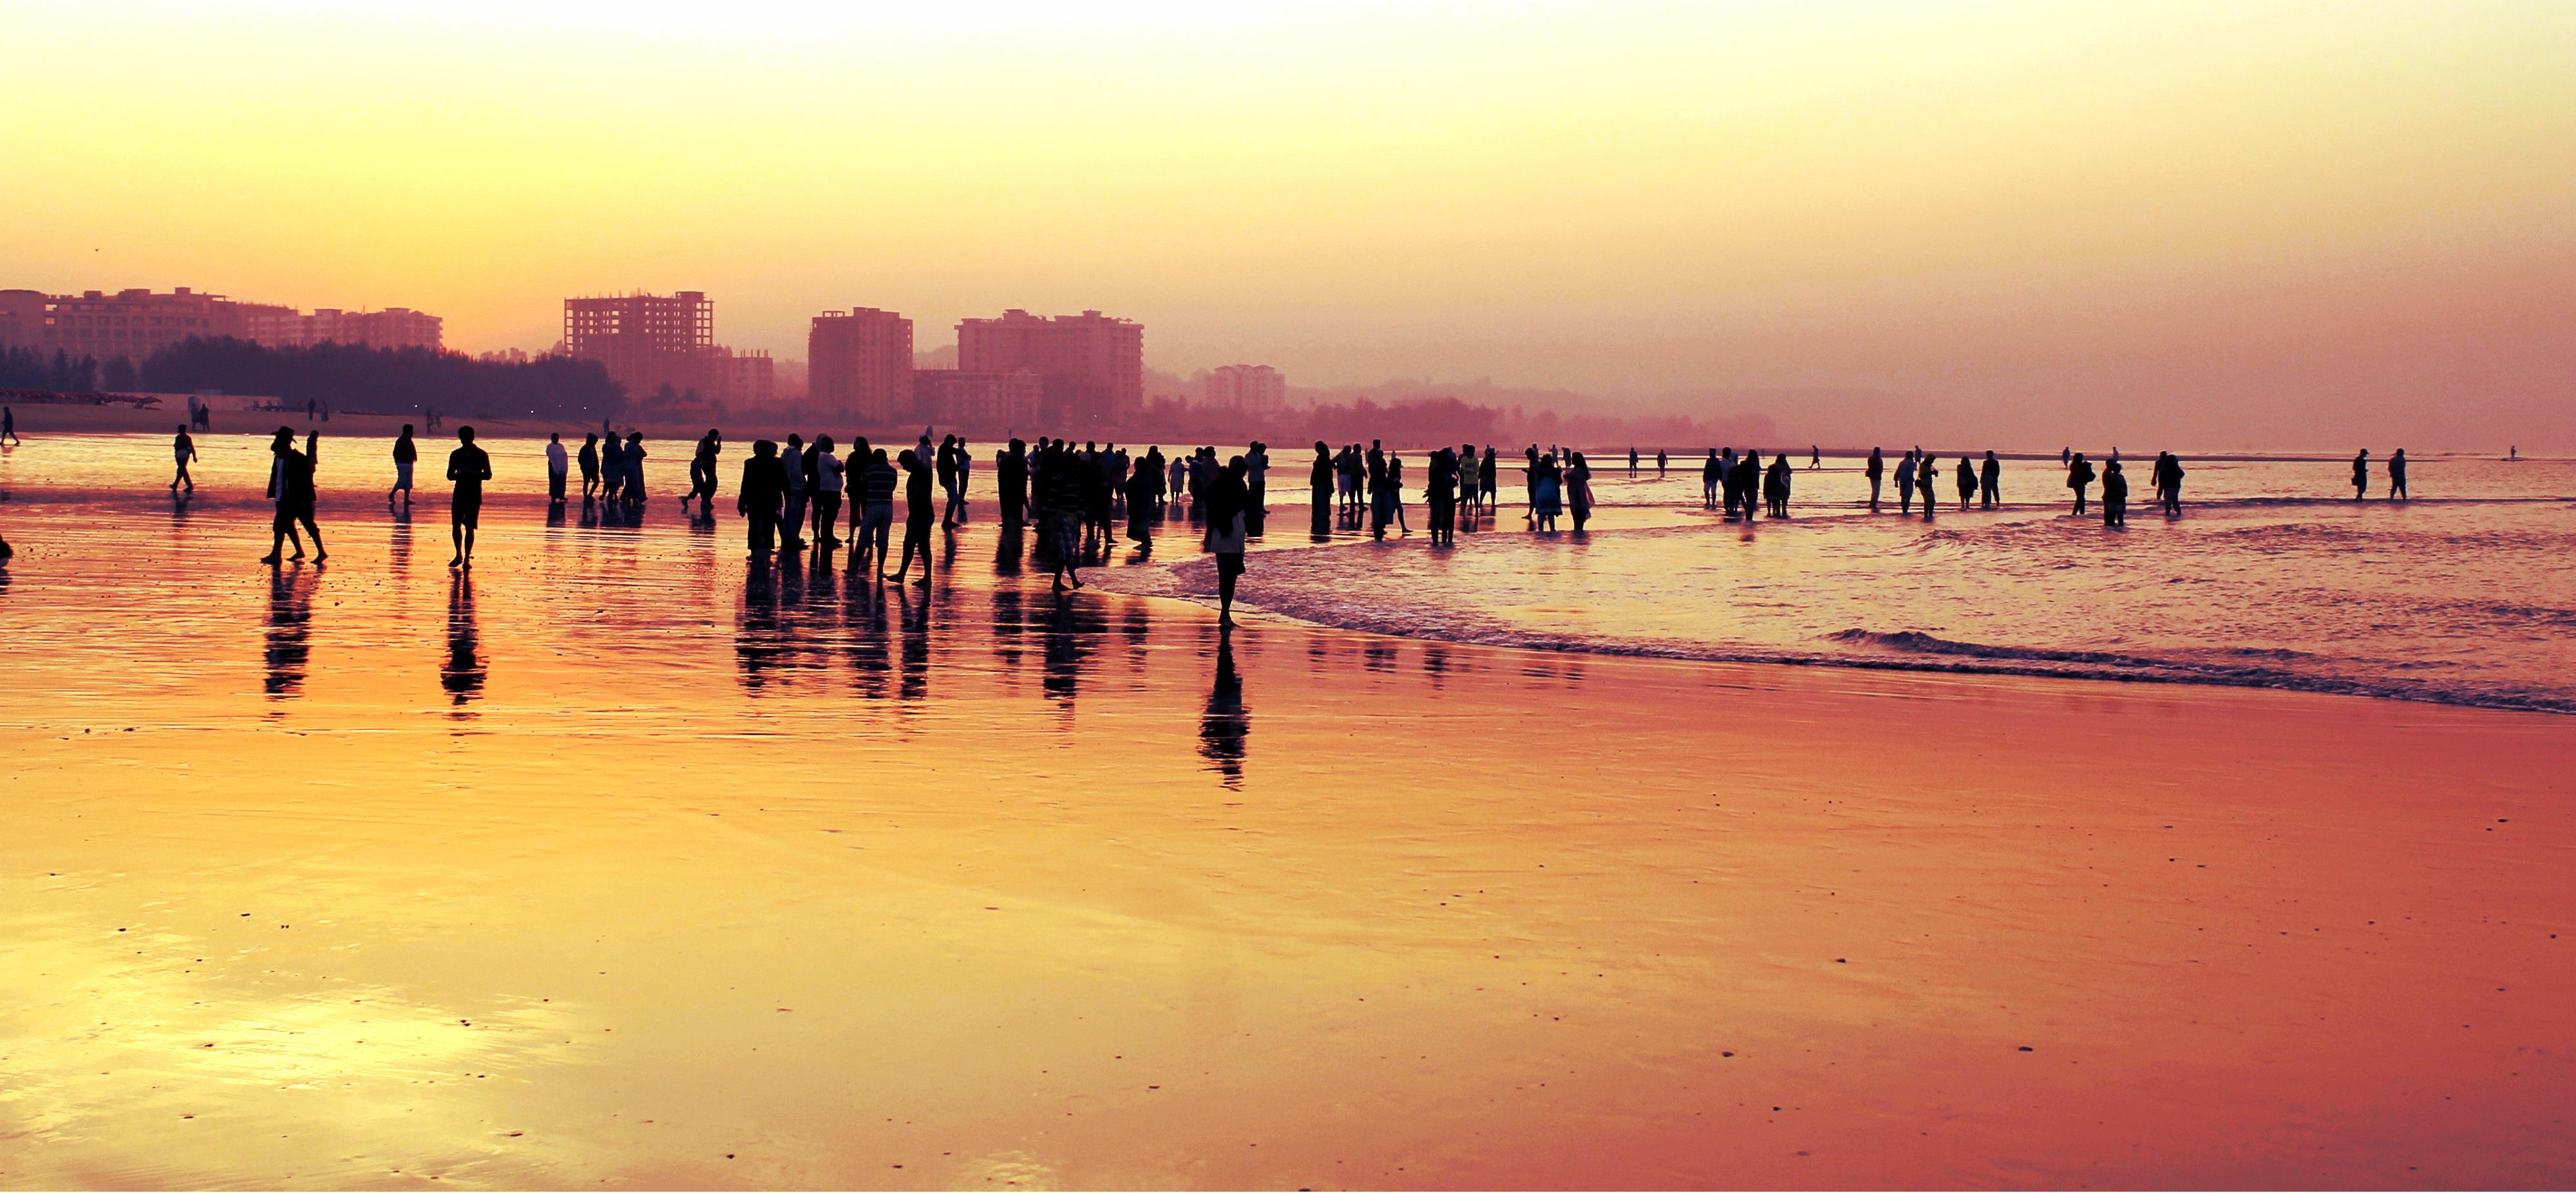 Gambar Manusia Laut Pasir Lautan Horison Bayangan